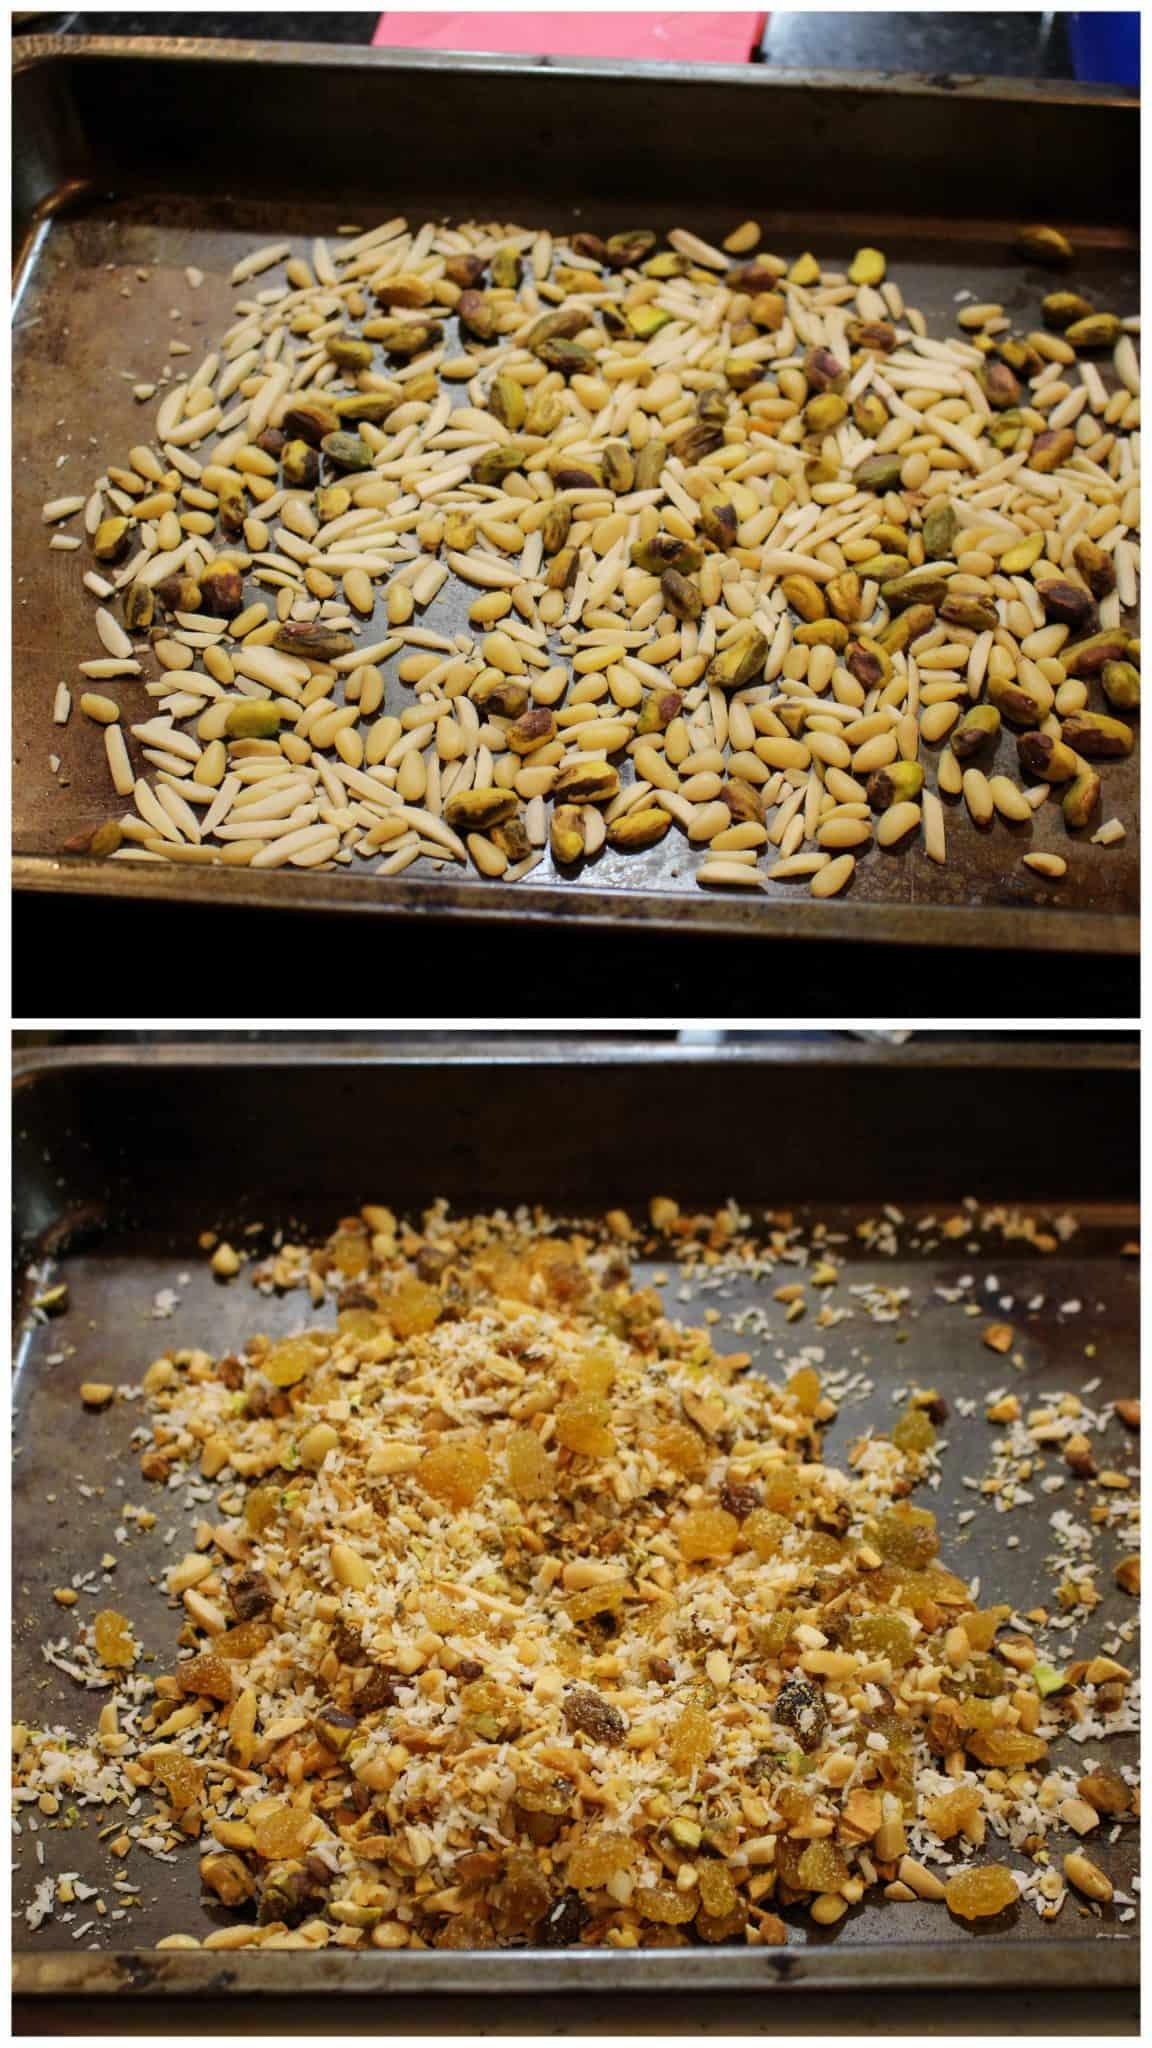 Roasting fry fruits